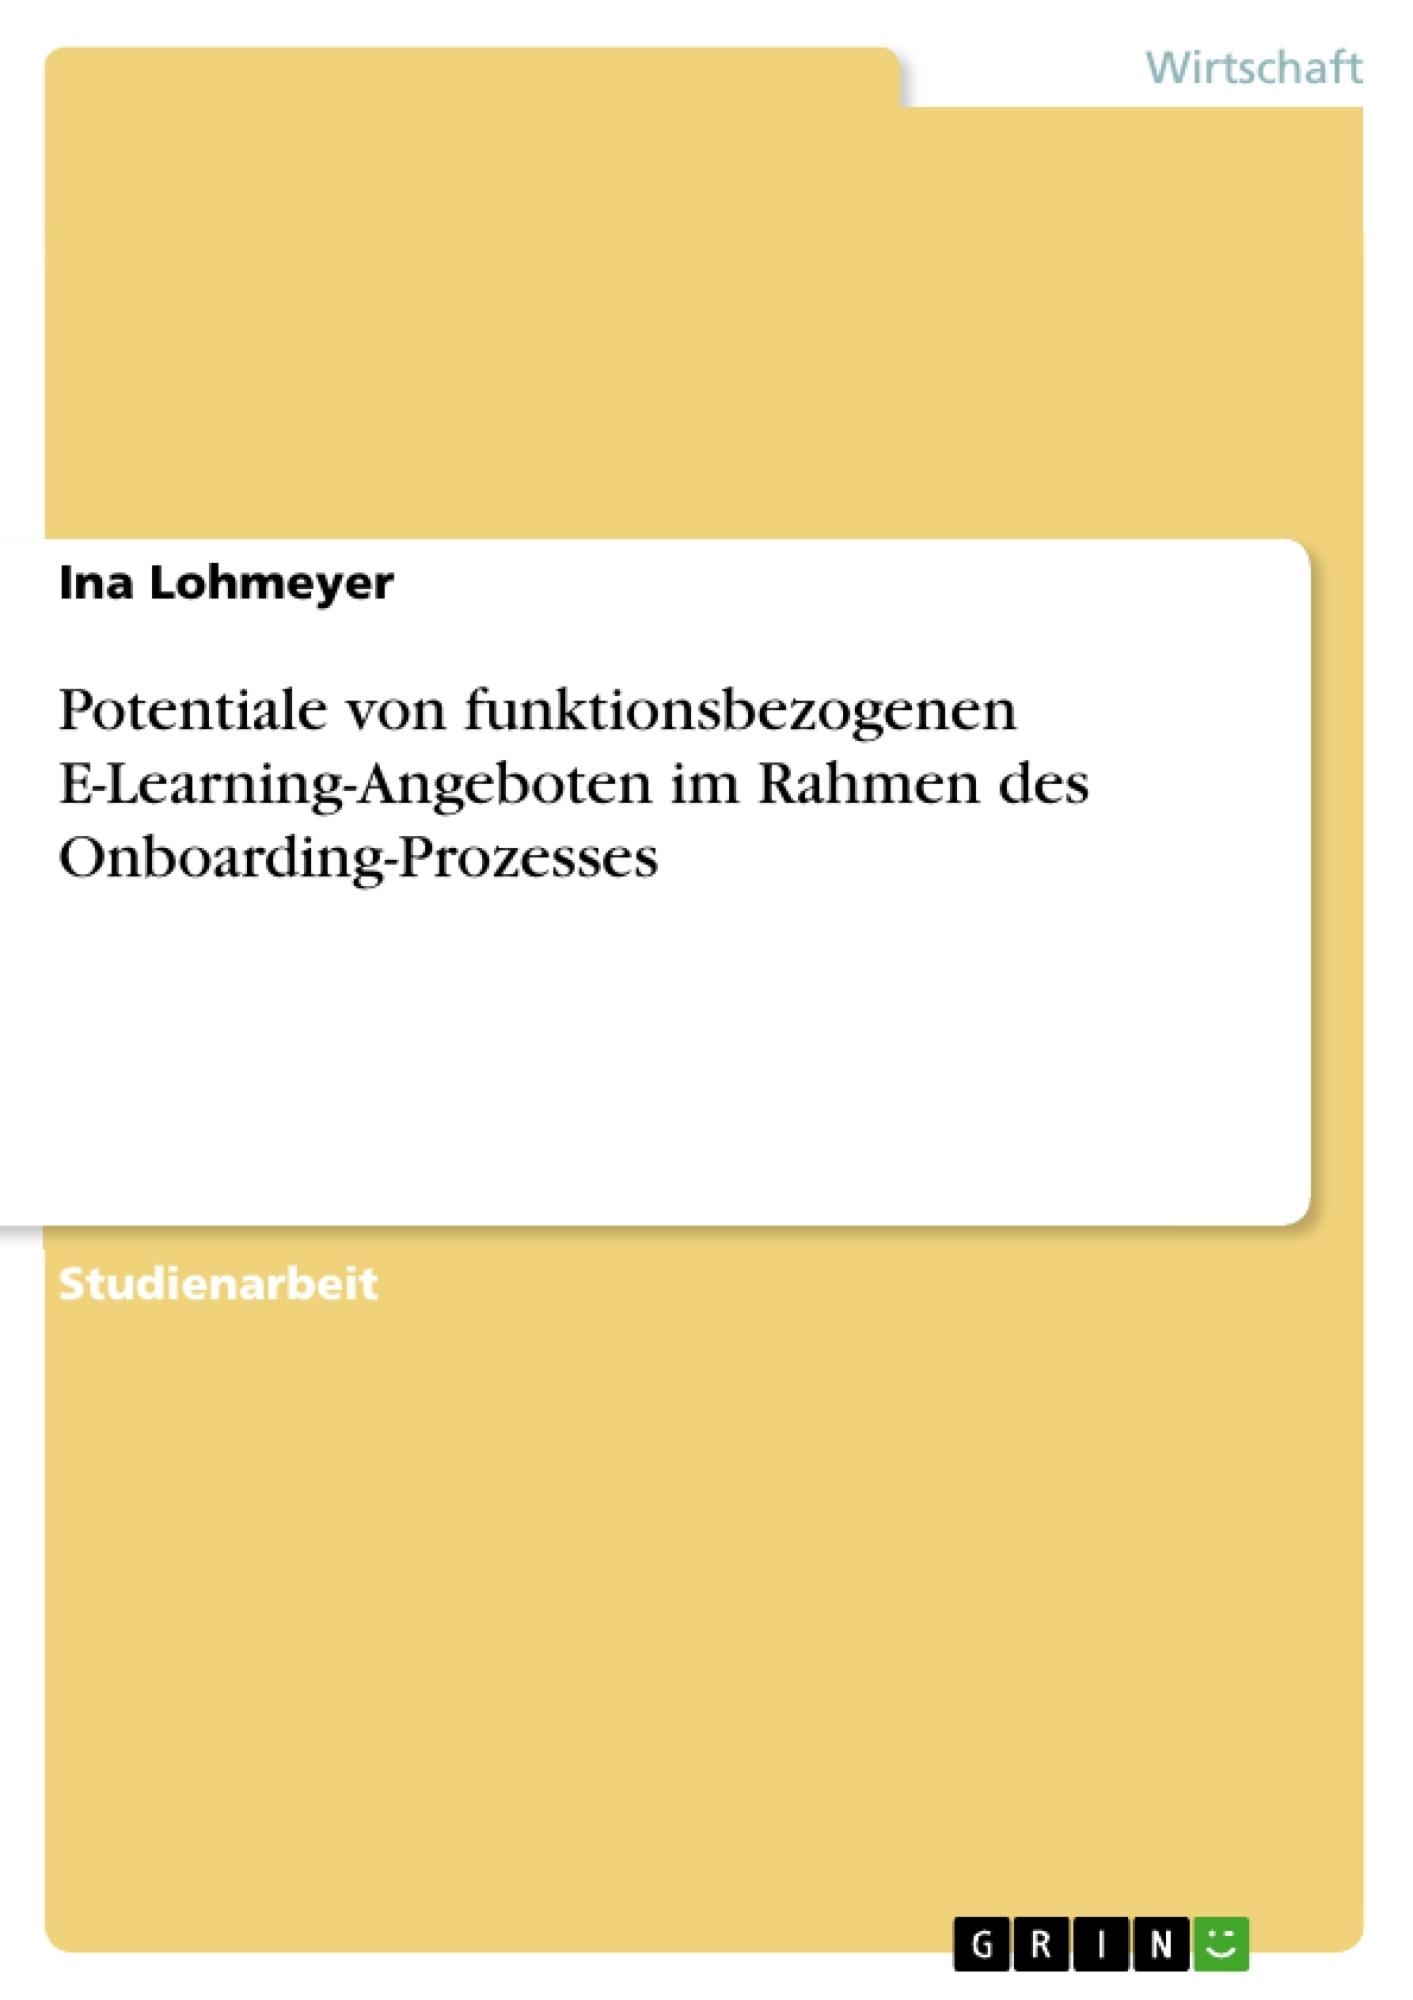 Titel: Potentiale von funktionsbezogenen E-Learning-Angeboten im Rahmen des Onboarding-Prozesses